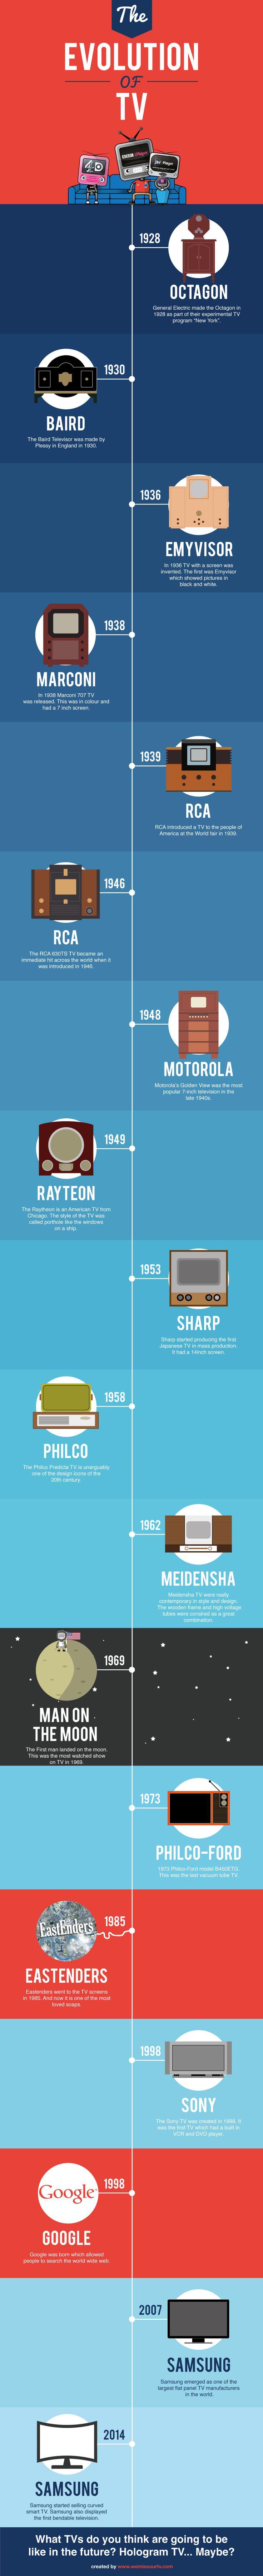 The Evolution of TV